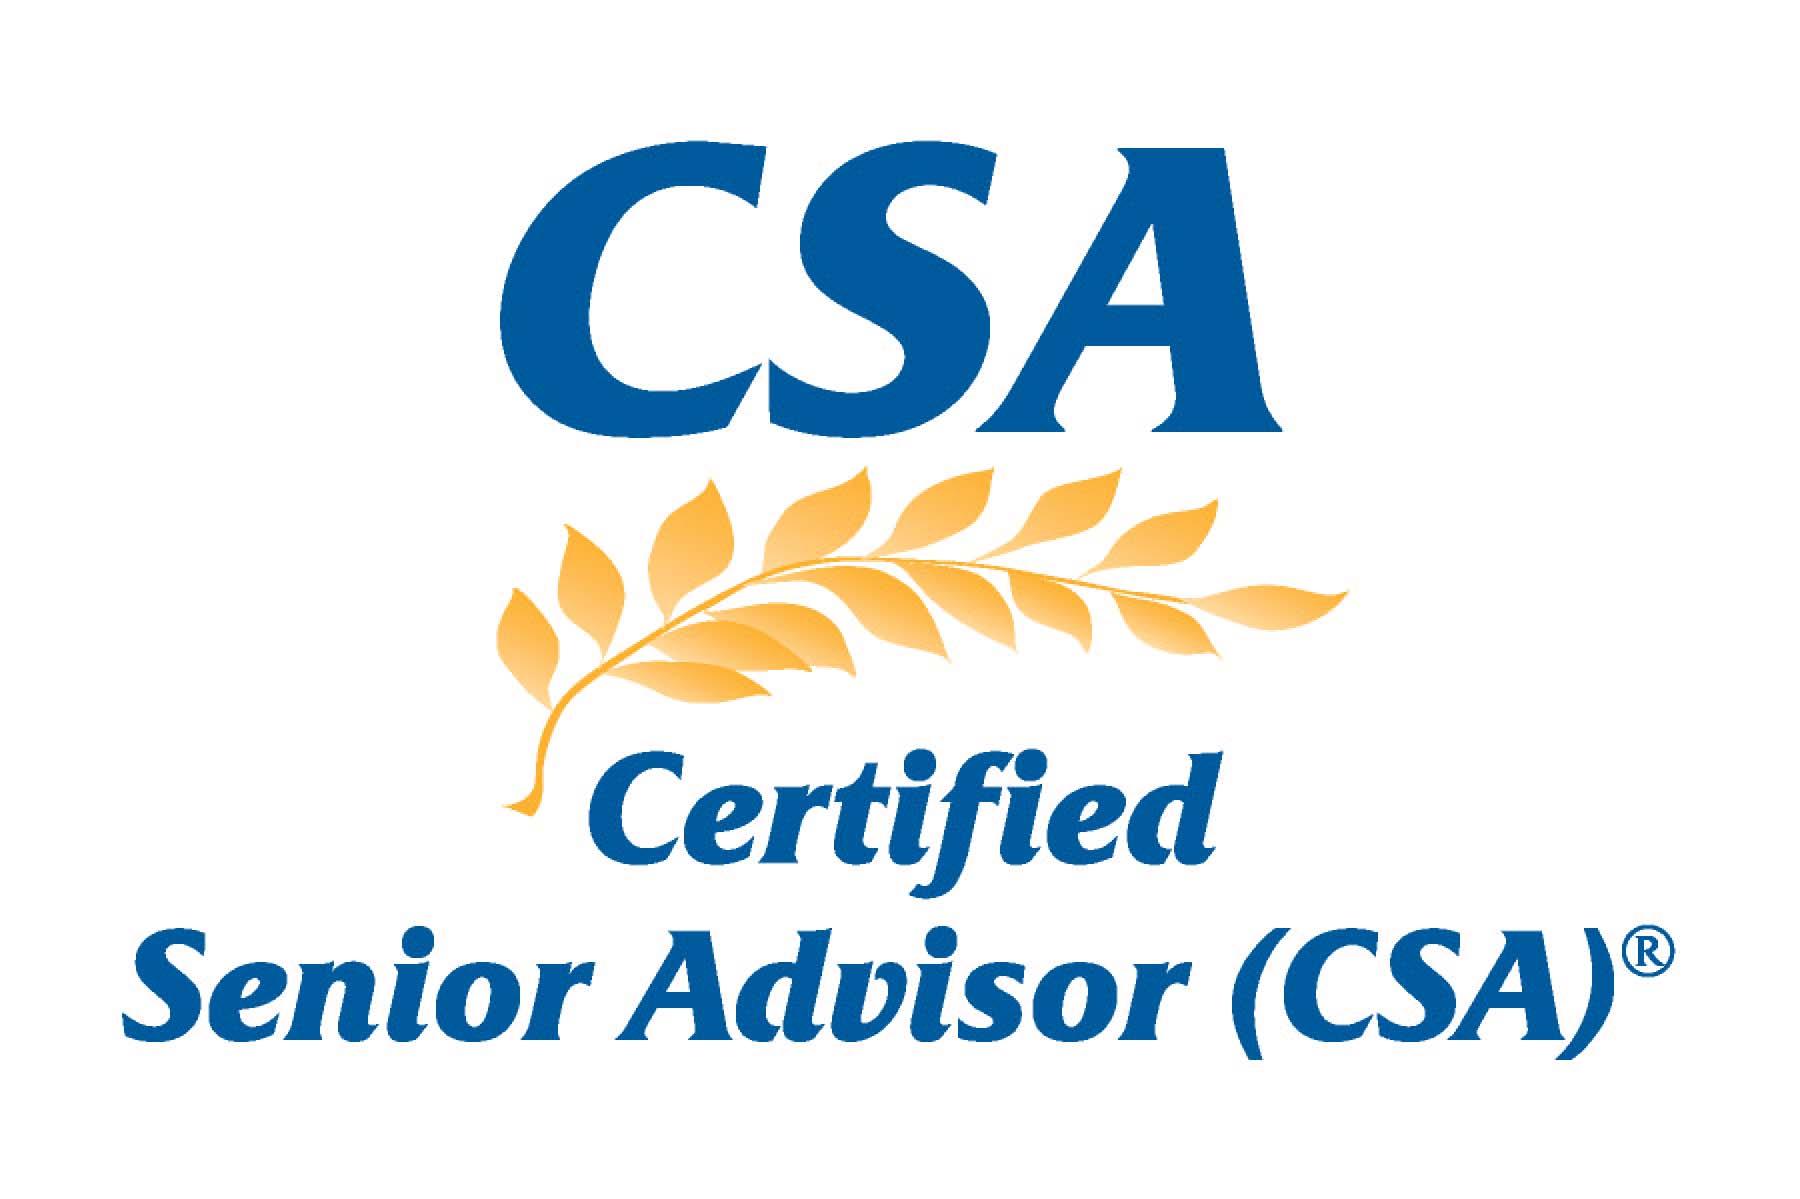 Senior real estate specialist sres the abcs of real estate rsa2 sreslogocmyknotag csa logo gri 1betcityfo Choice Image